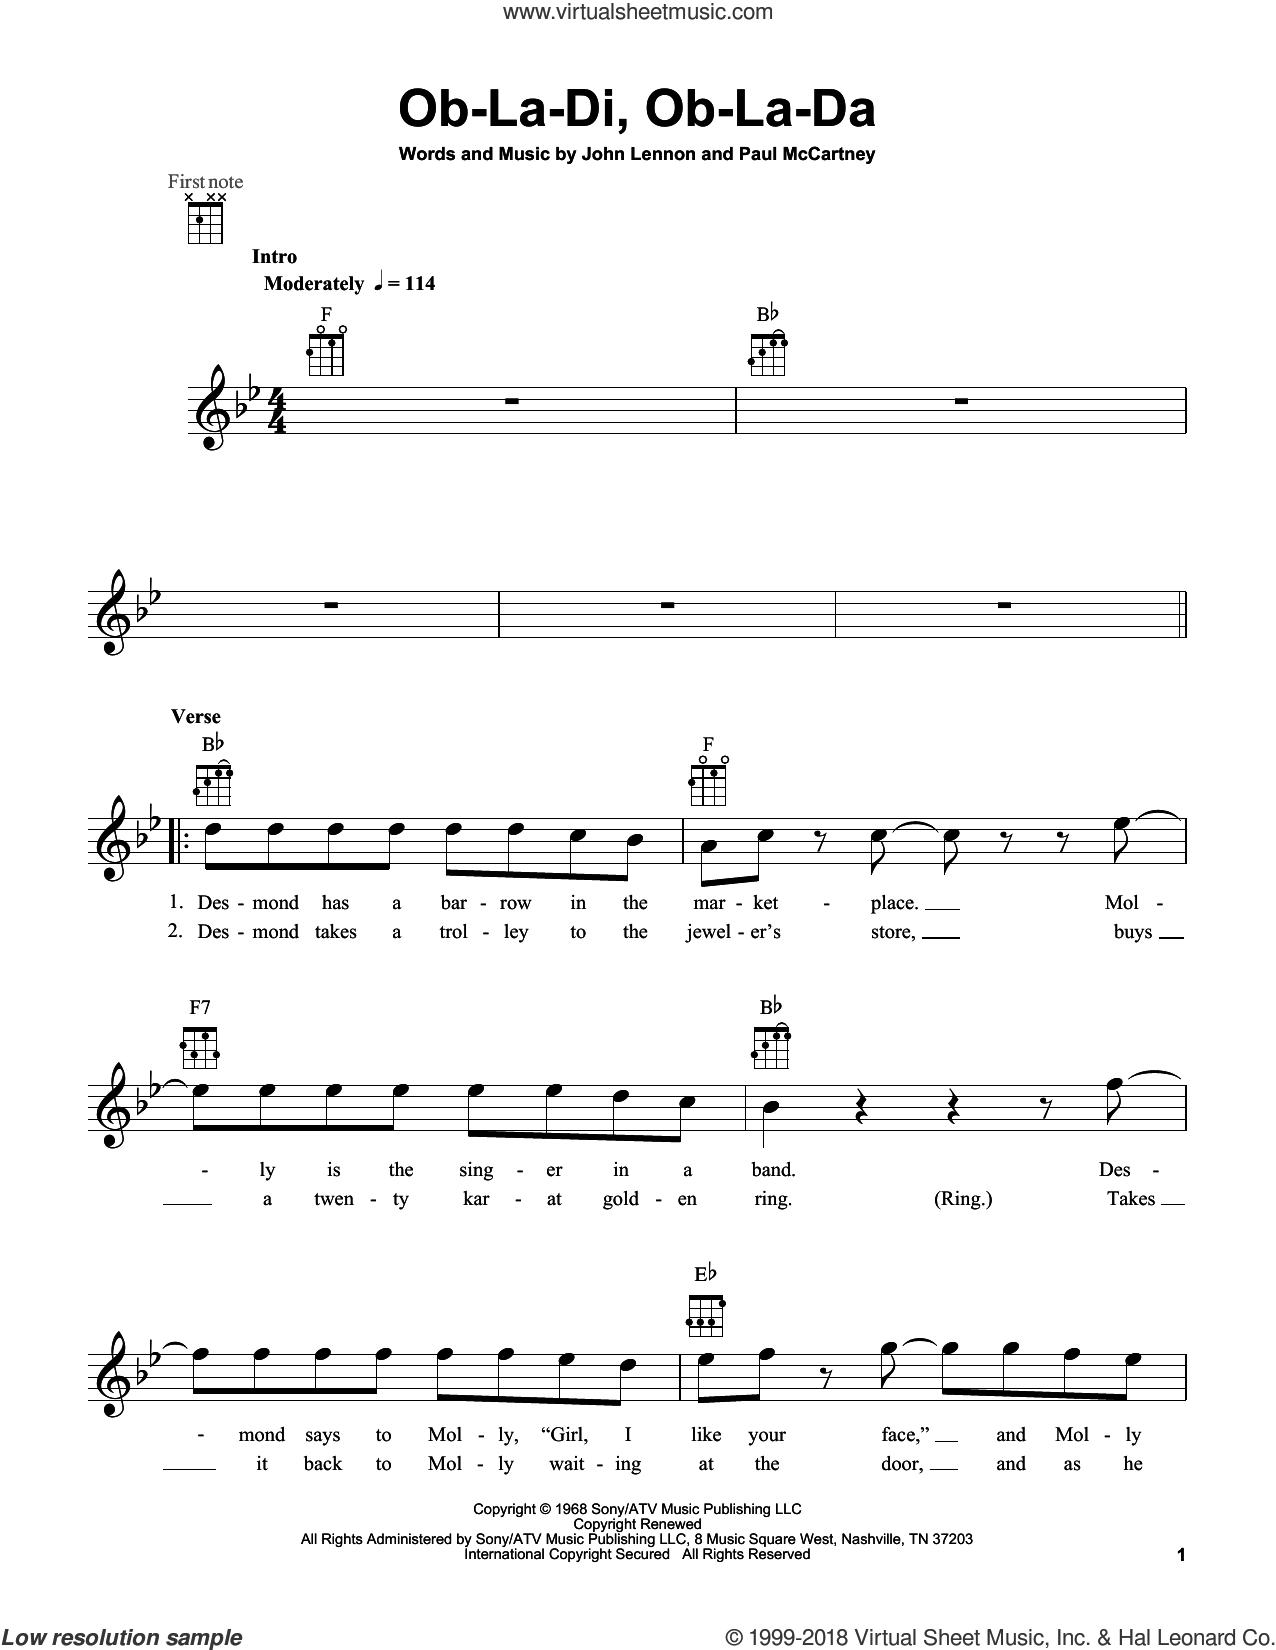 Ob-La-Di, Ob-La-Da sheet music for ukulele by The Beatles, John Lennon and Paul McCartney, intermediate skill level